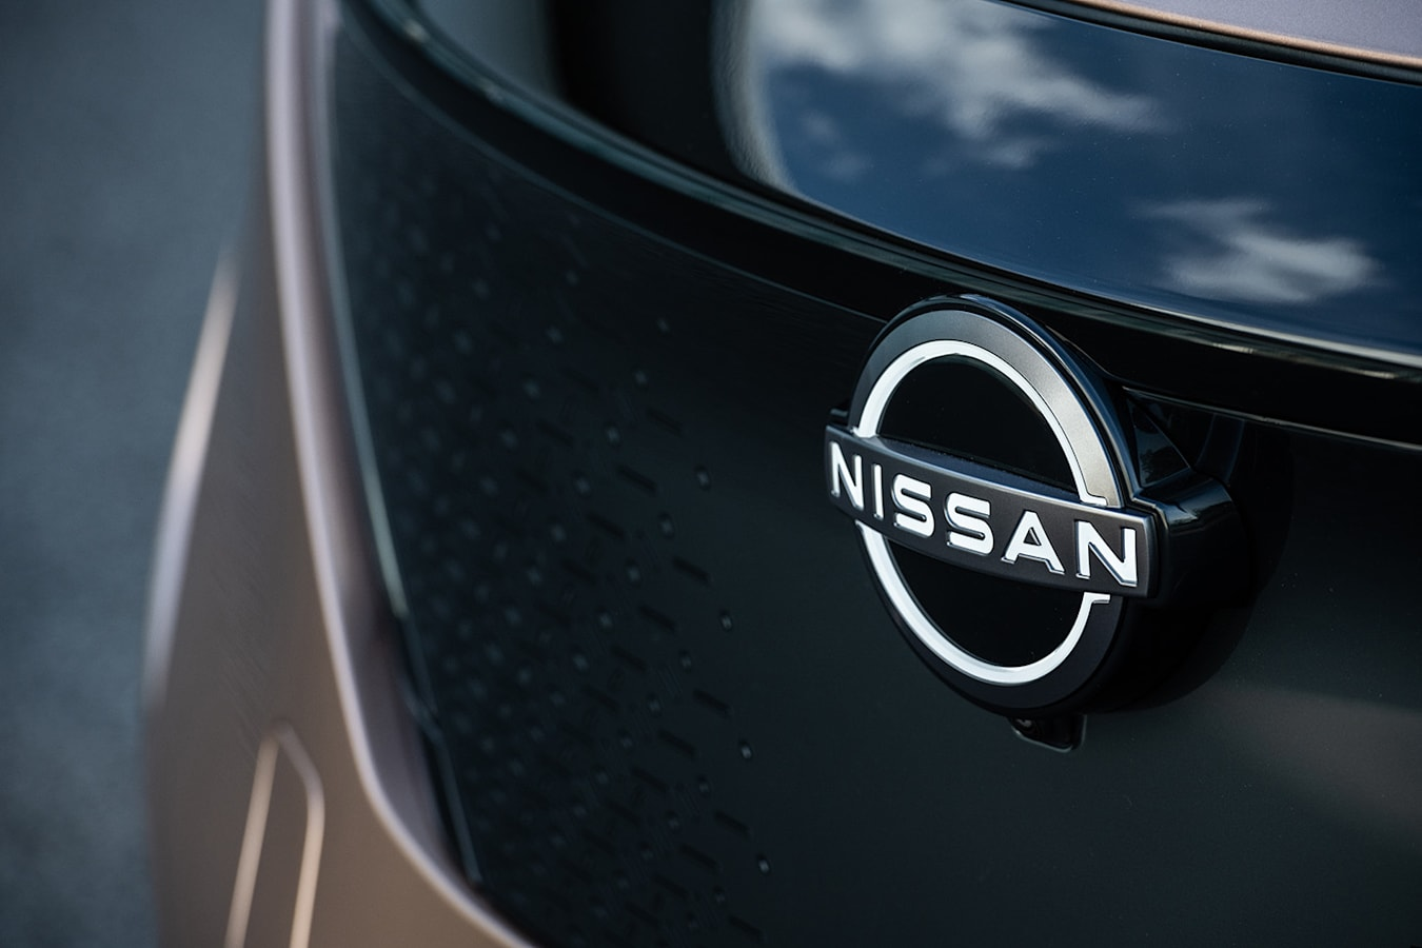 Nissan Ariya Exterior 284 29 Web Jpg